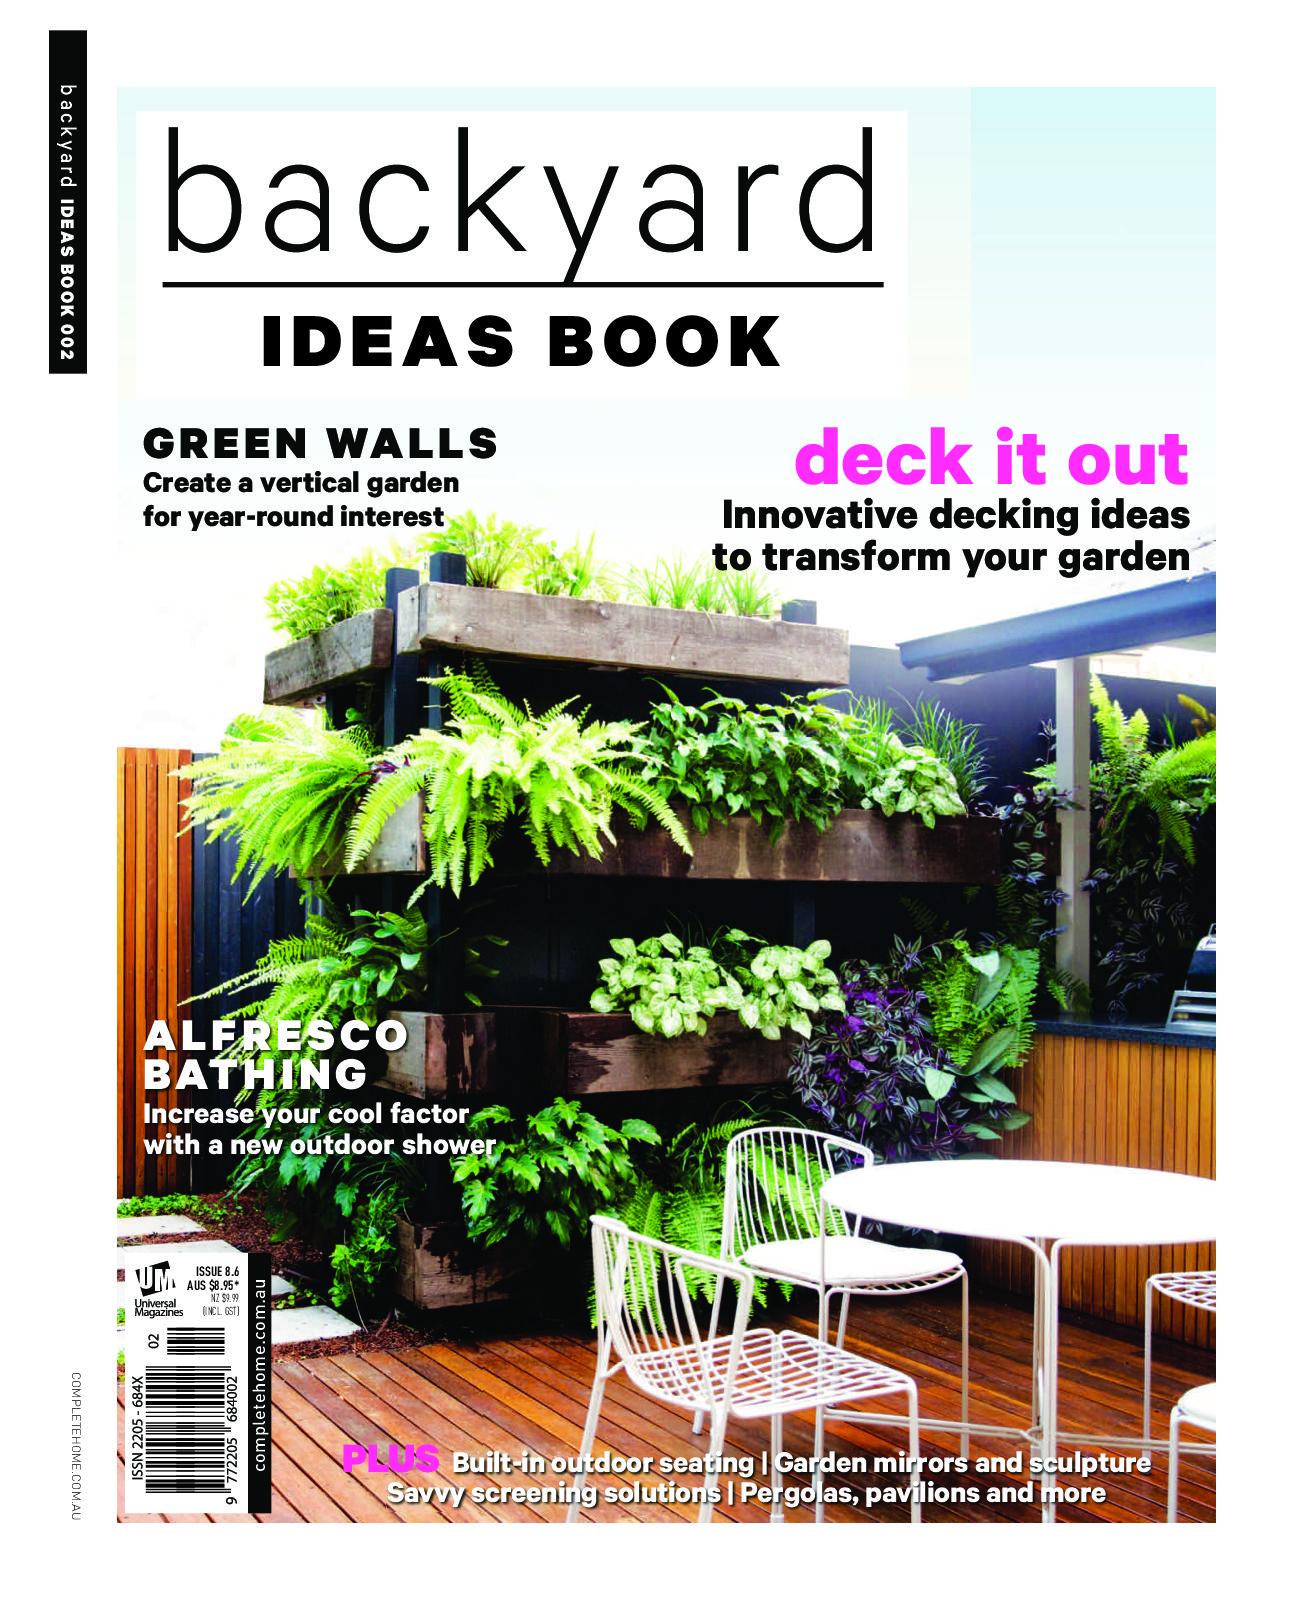 Backyard ideas book 2017 growing rooms landscapes for for Garden design ideas book